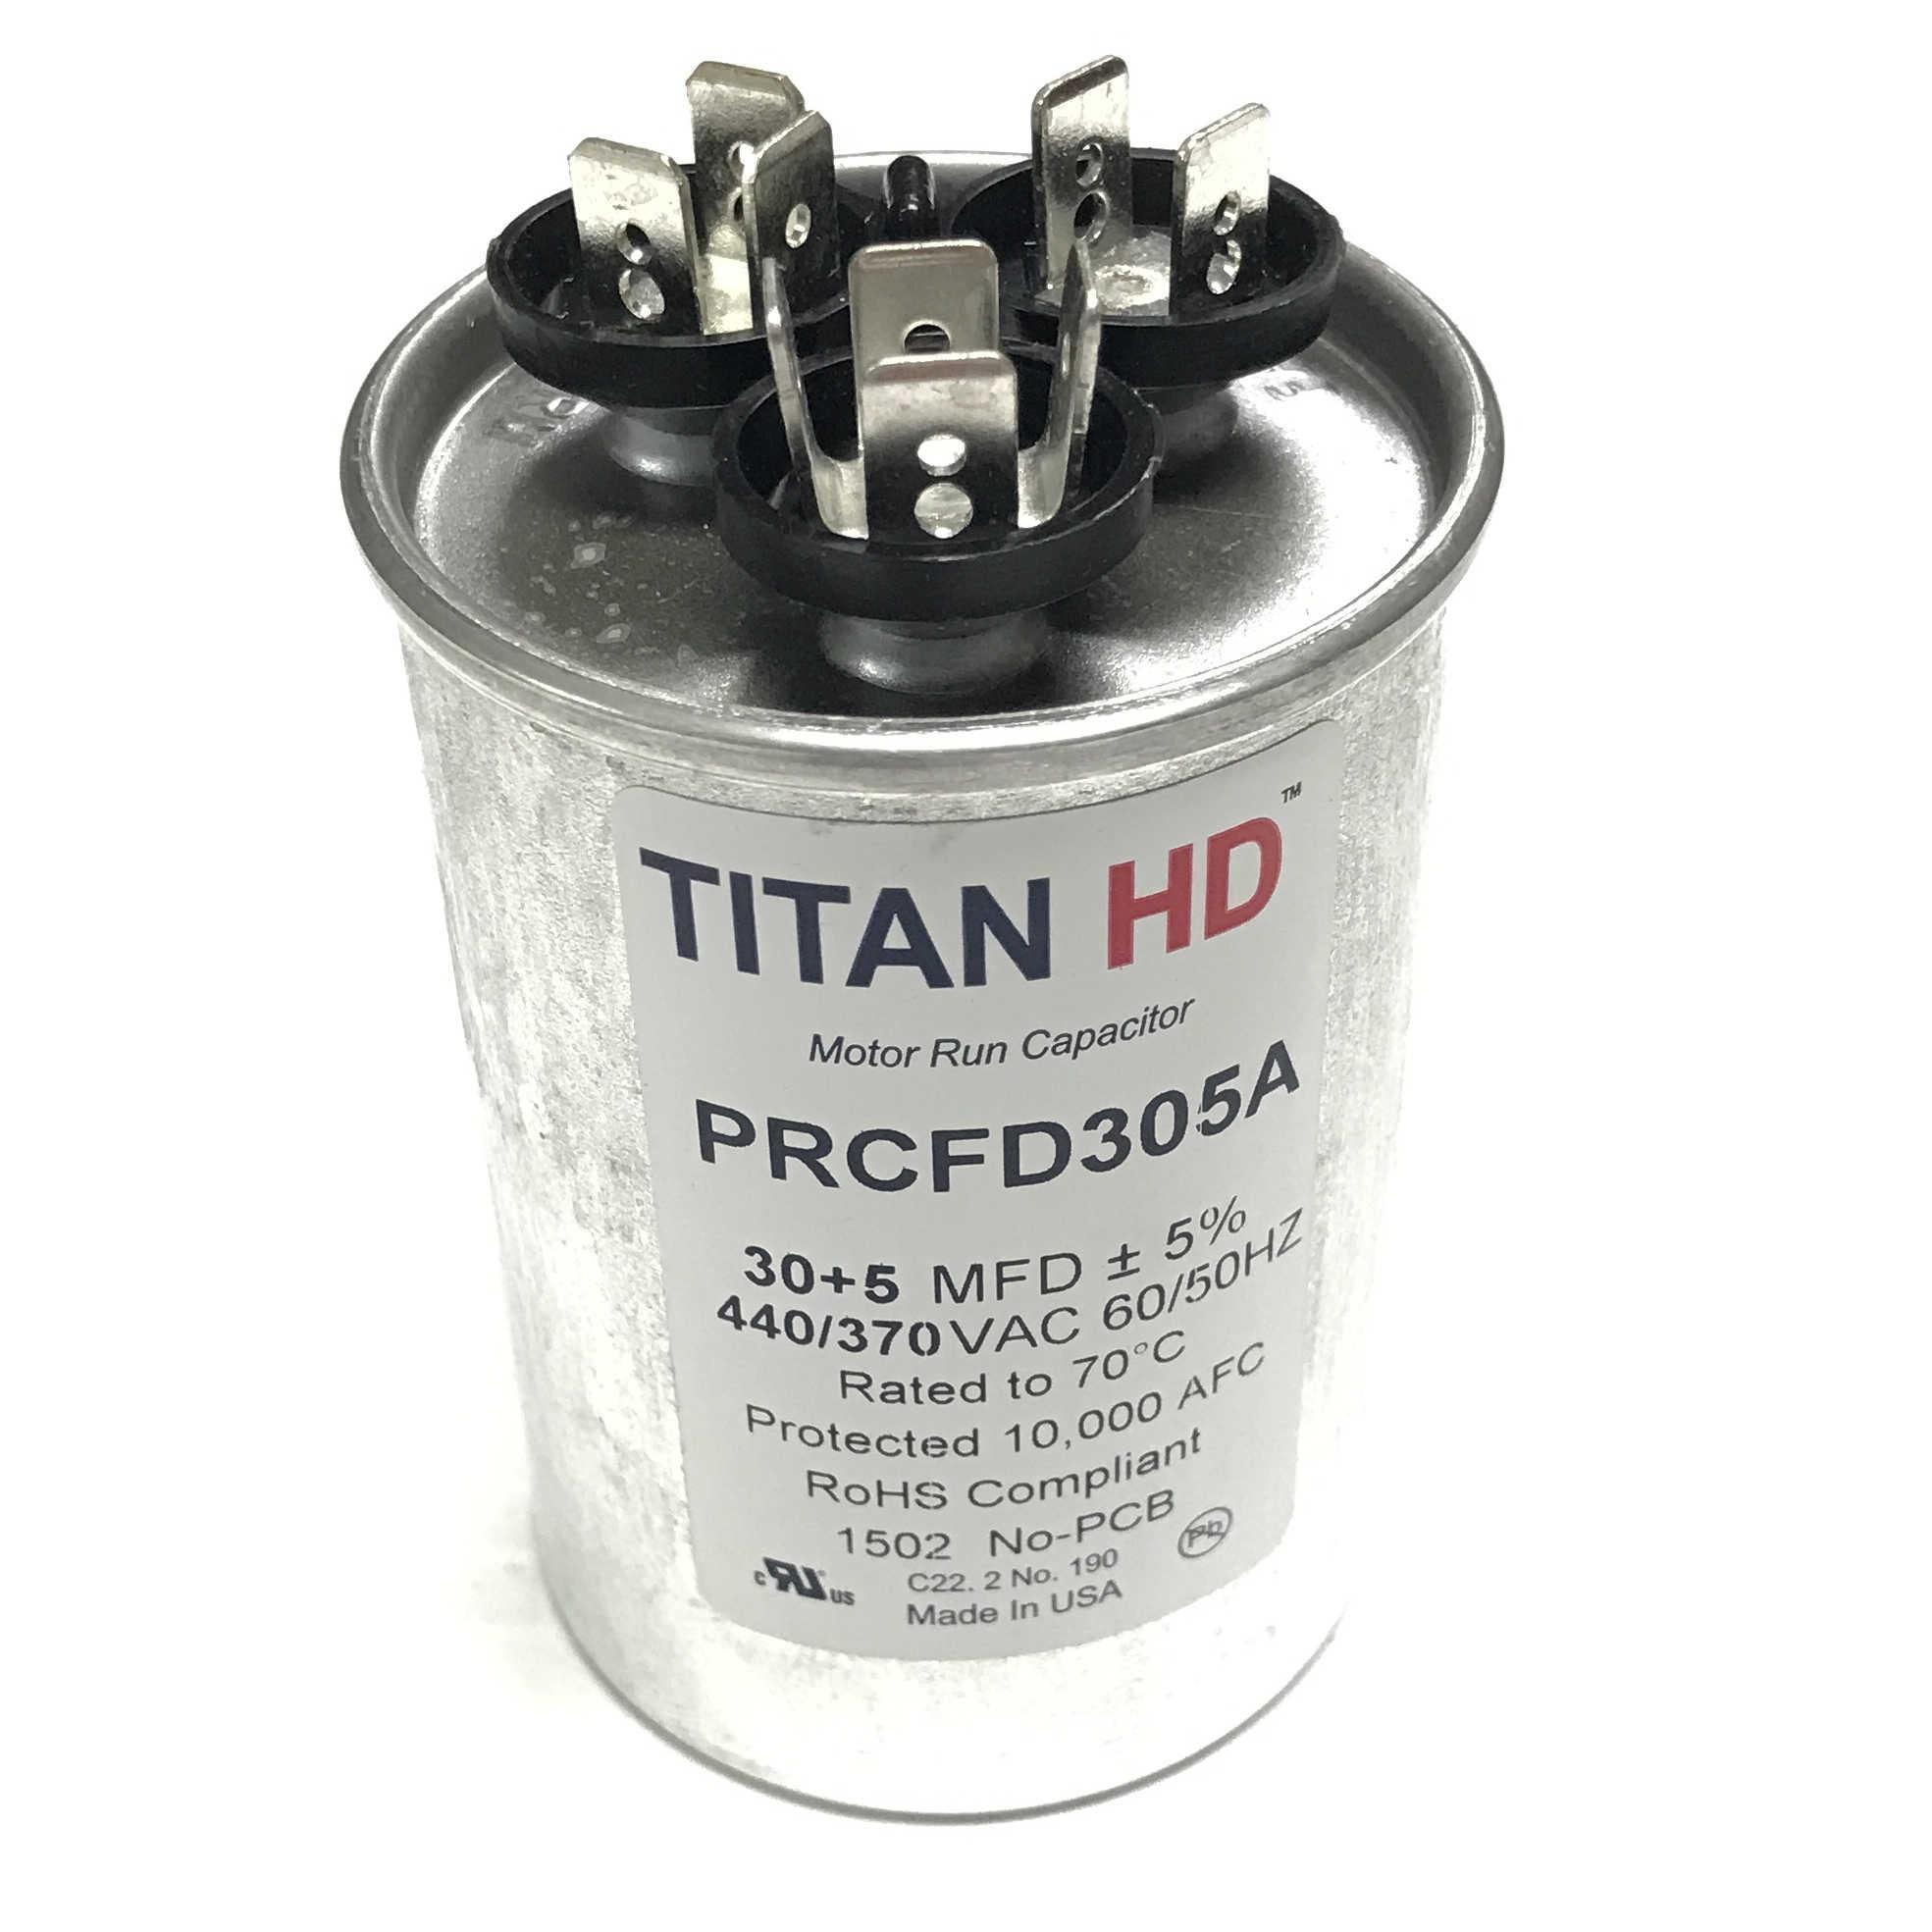 PRCFD305A 30+5 MFD Titan HD Run Capacitor